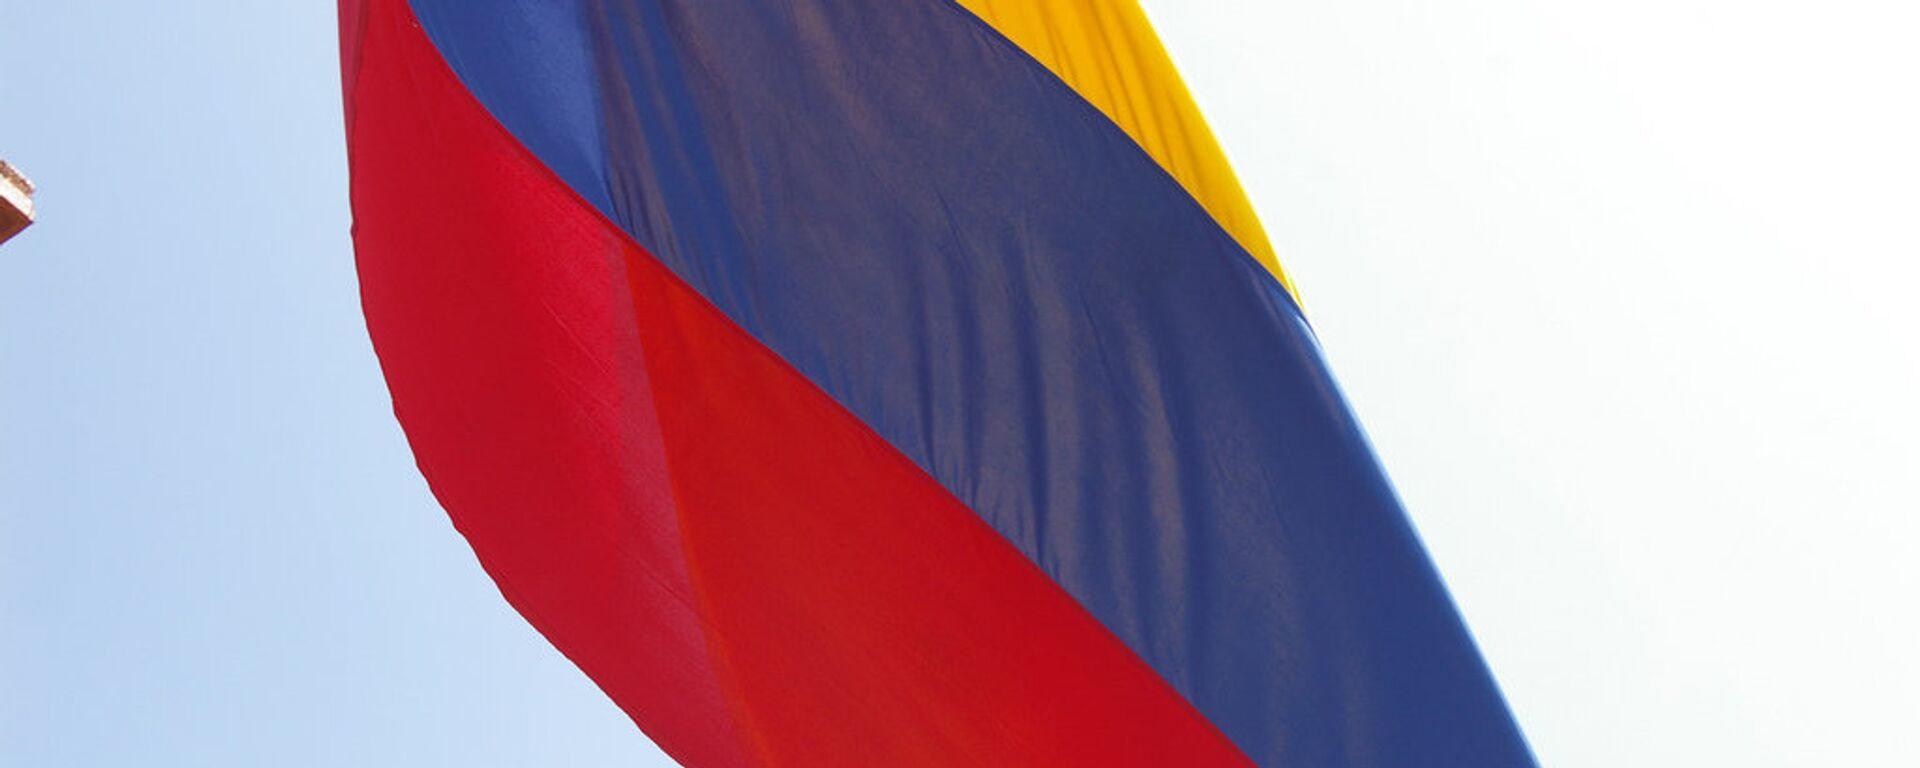 Bandera de Colombia - Sputnik Mundo, 1920, 13.07.2021